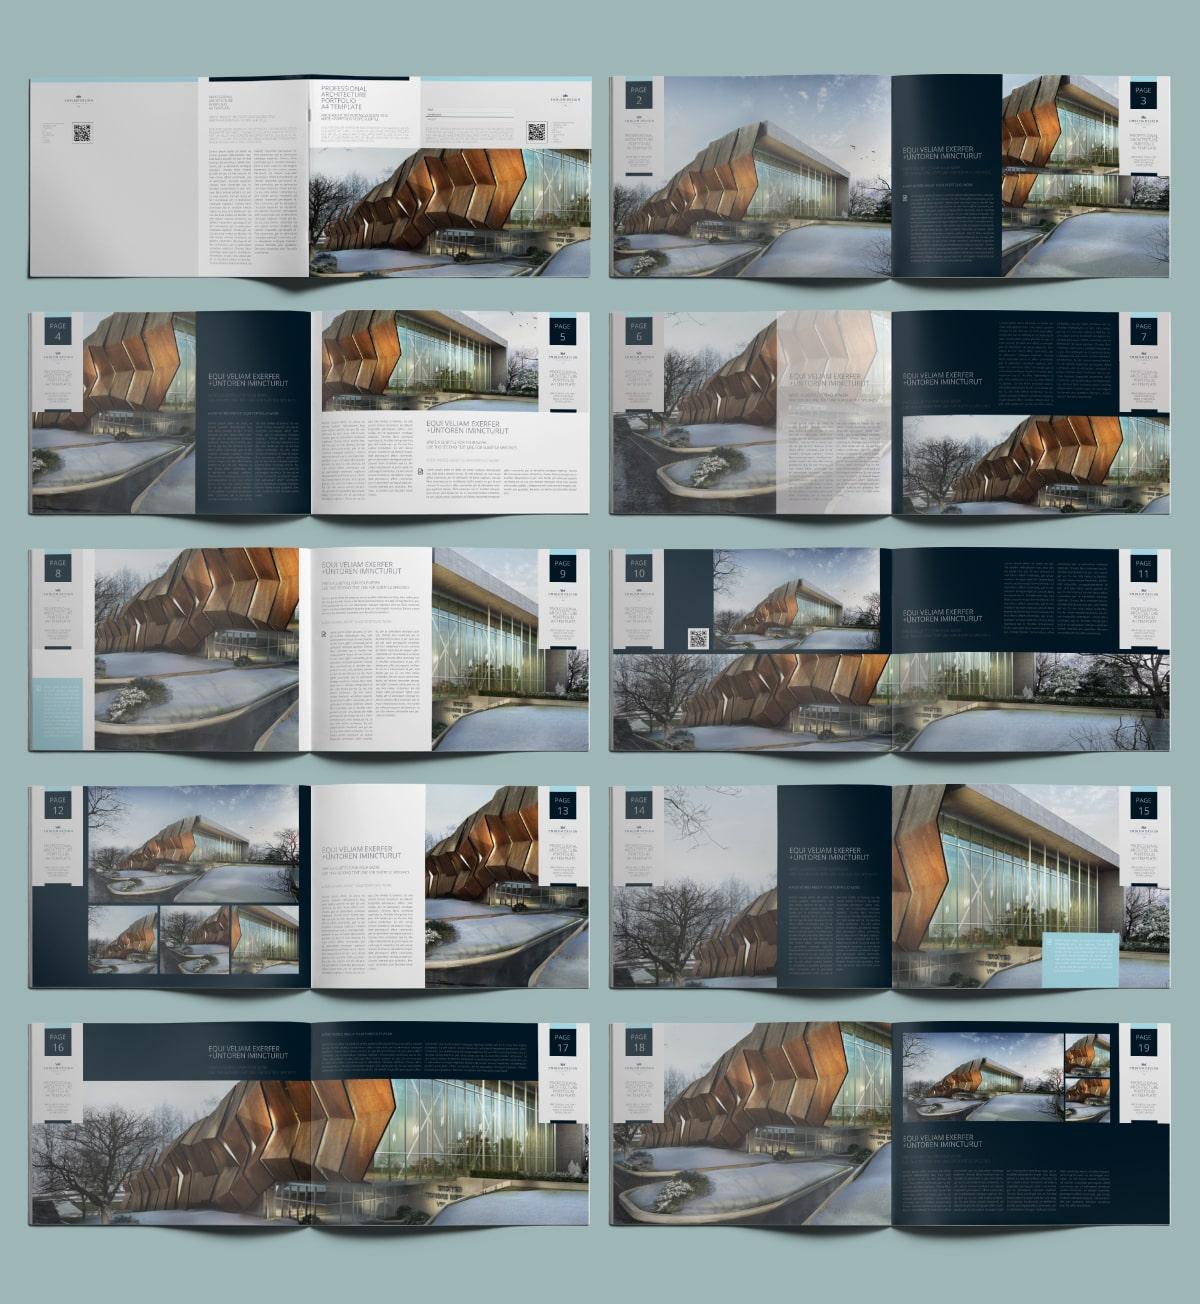 Professional Architecture Portfolio A4 Template - Layouts